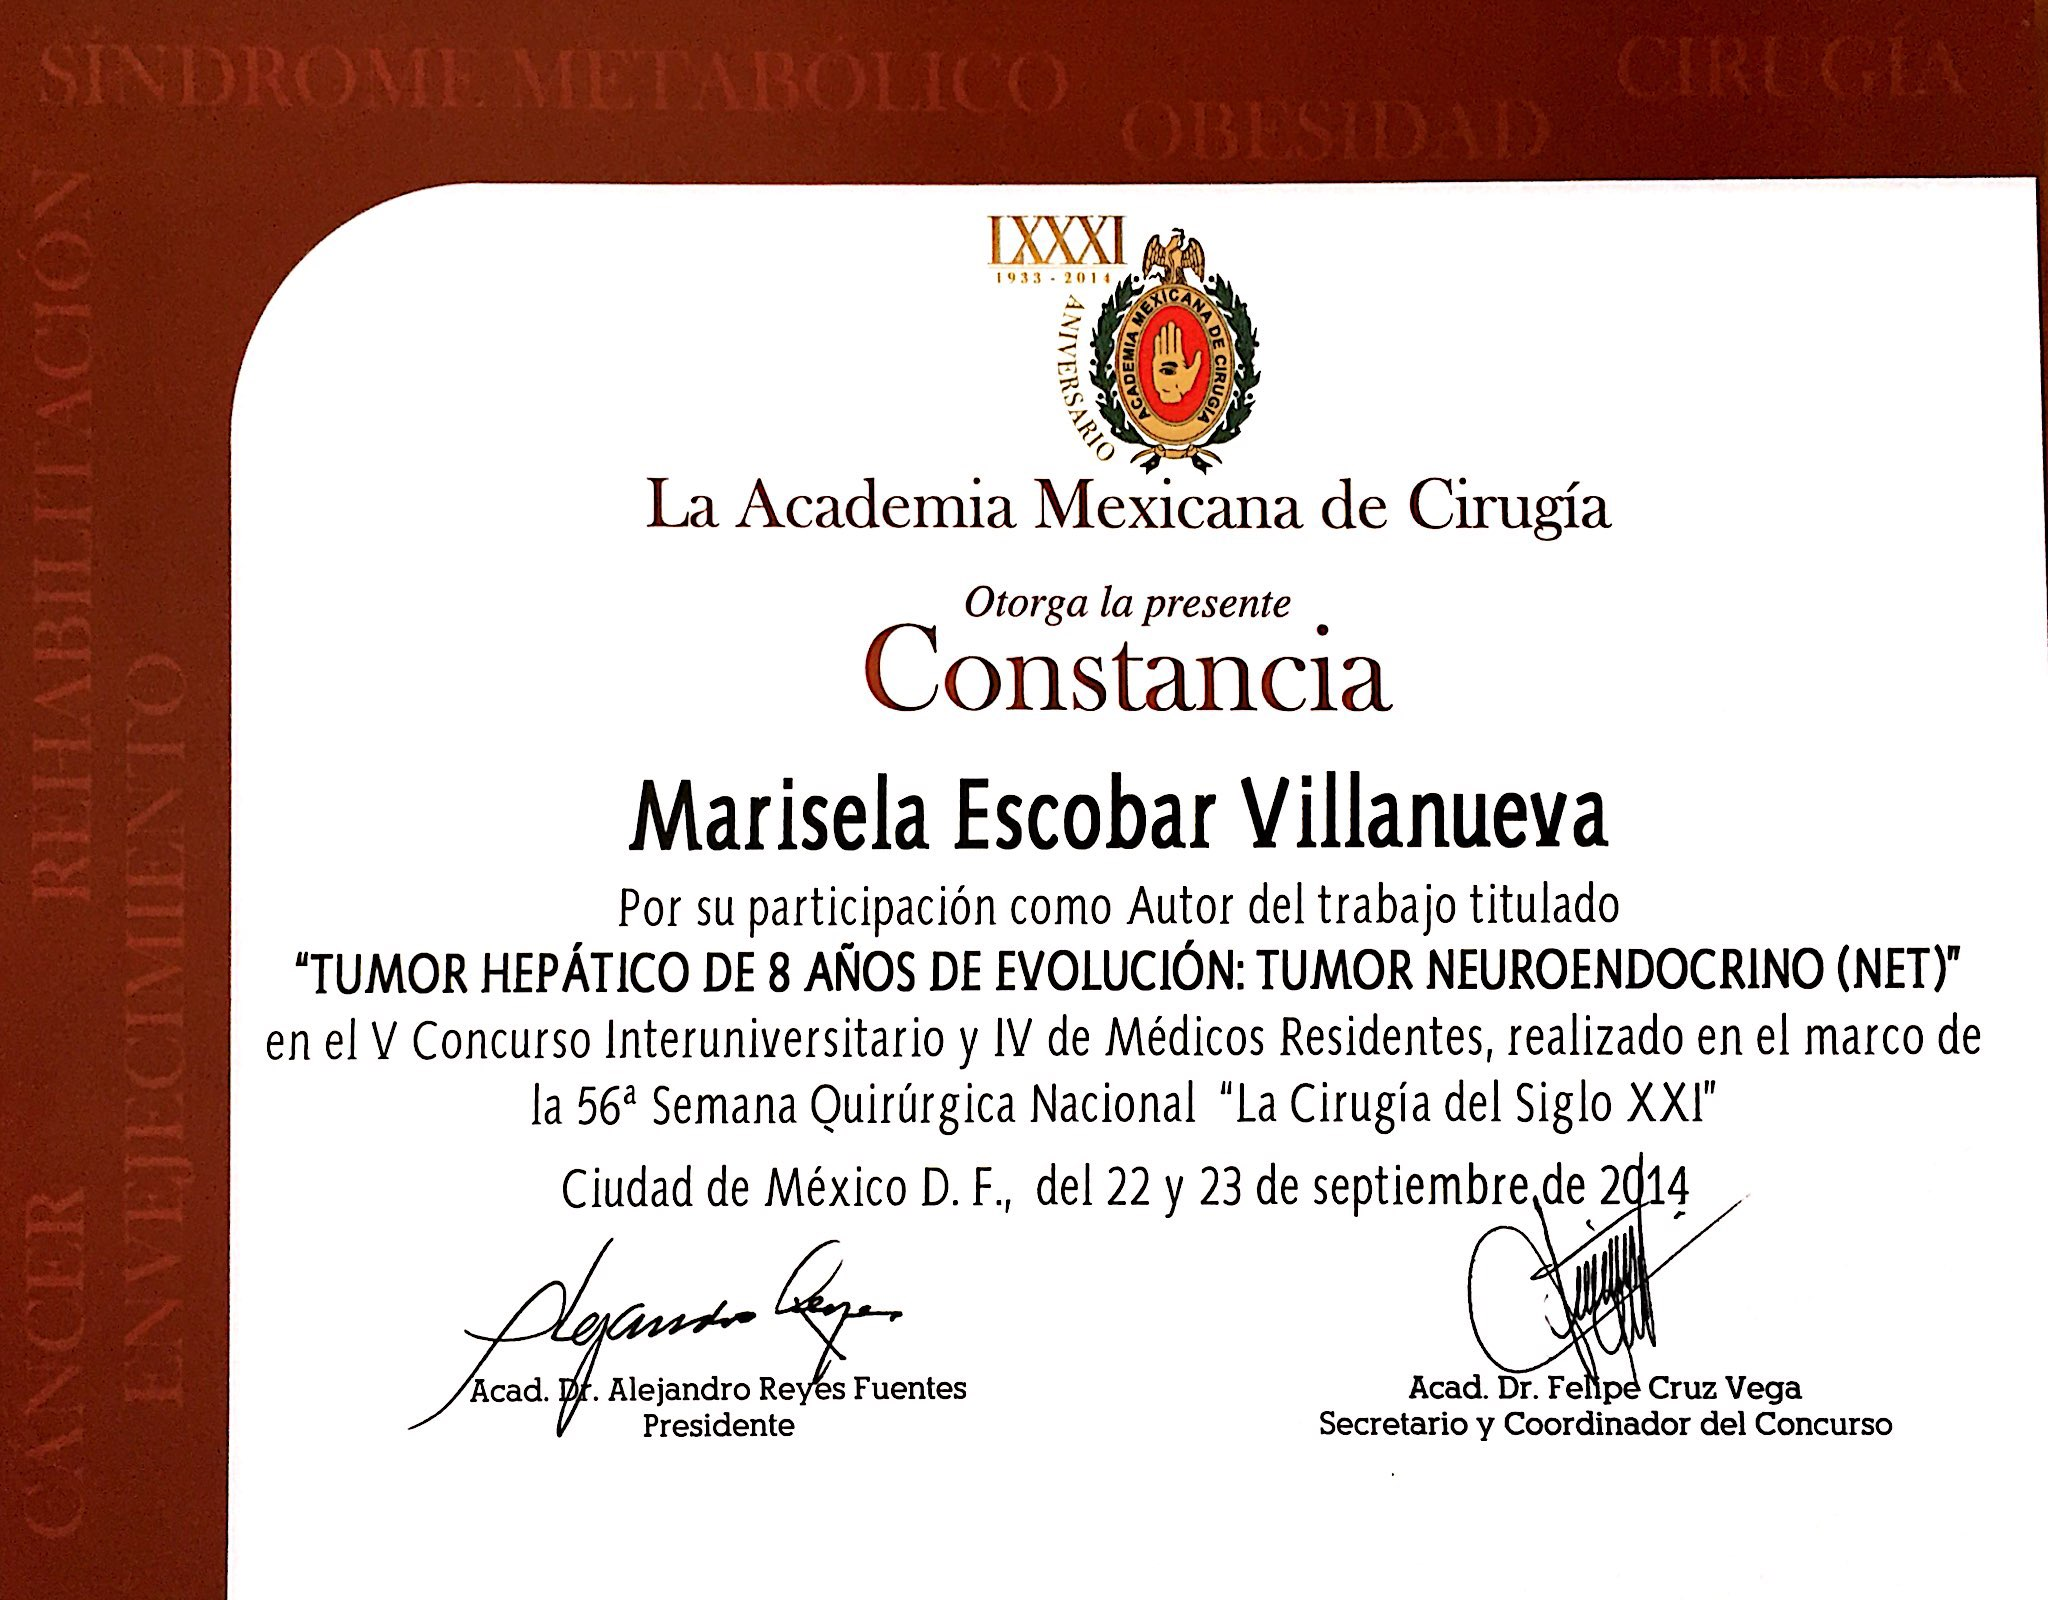 Nuevo doc 2018-02-20 11.21.39_4